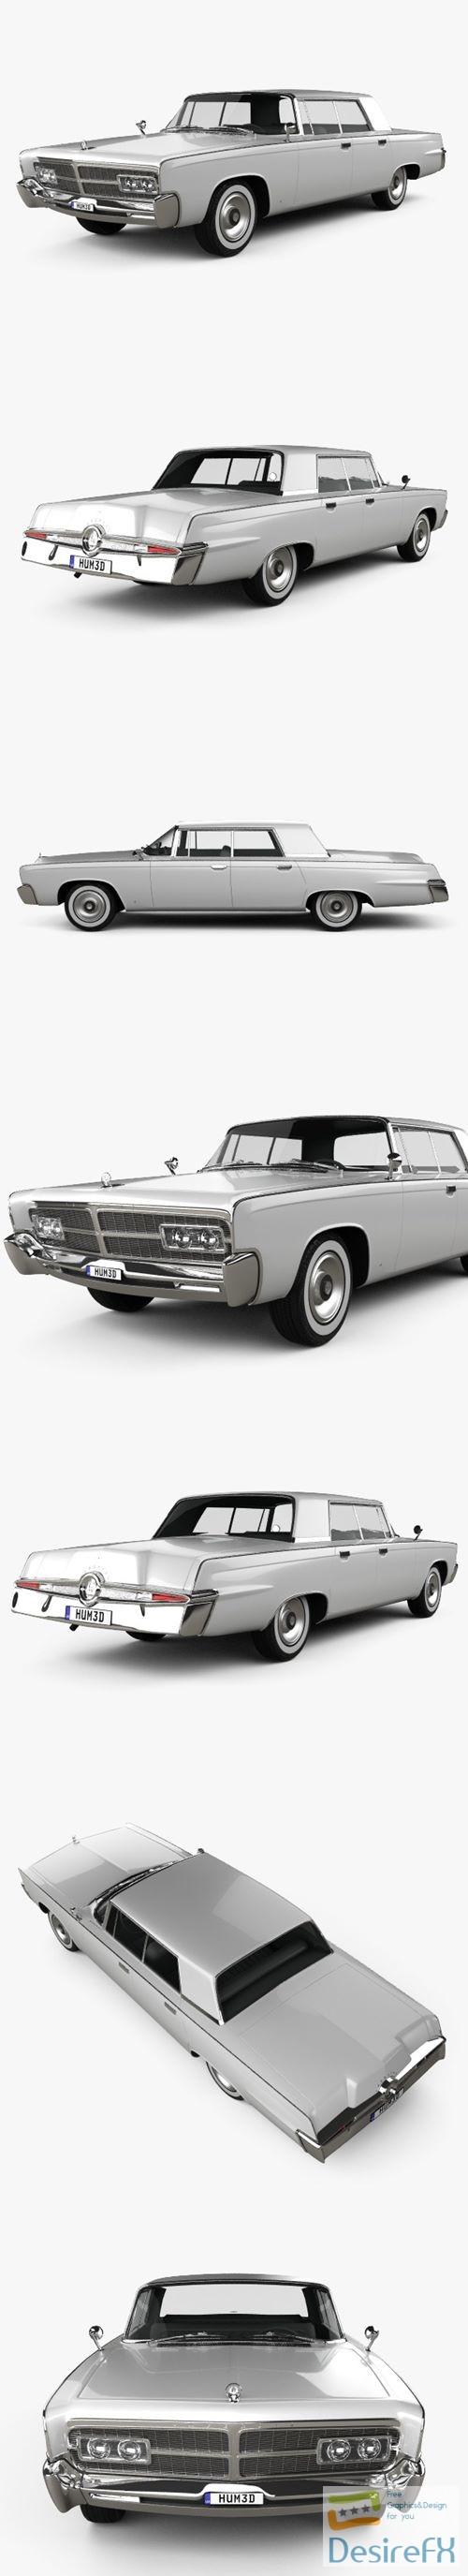 Chrysler Imperial Crown 1965 3D Model